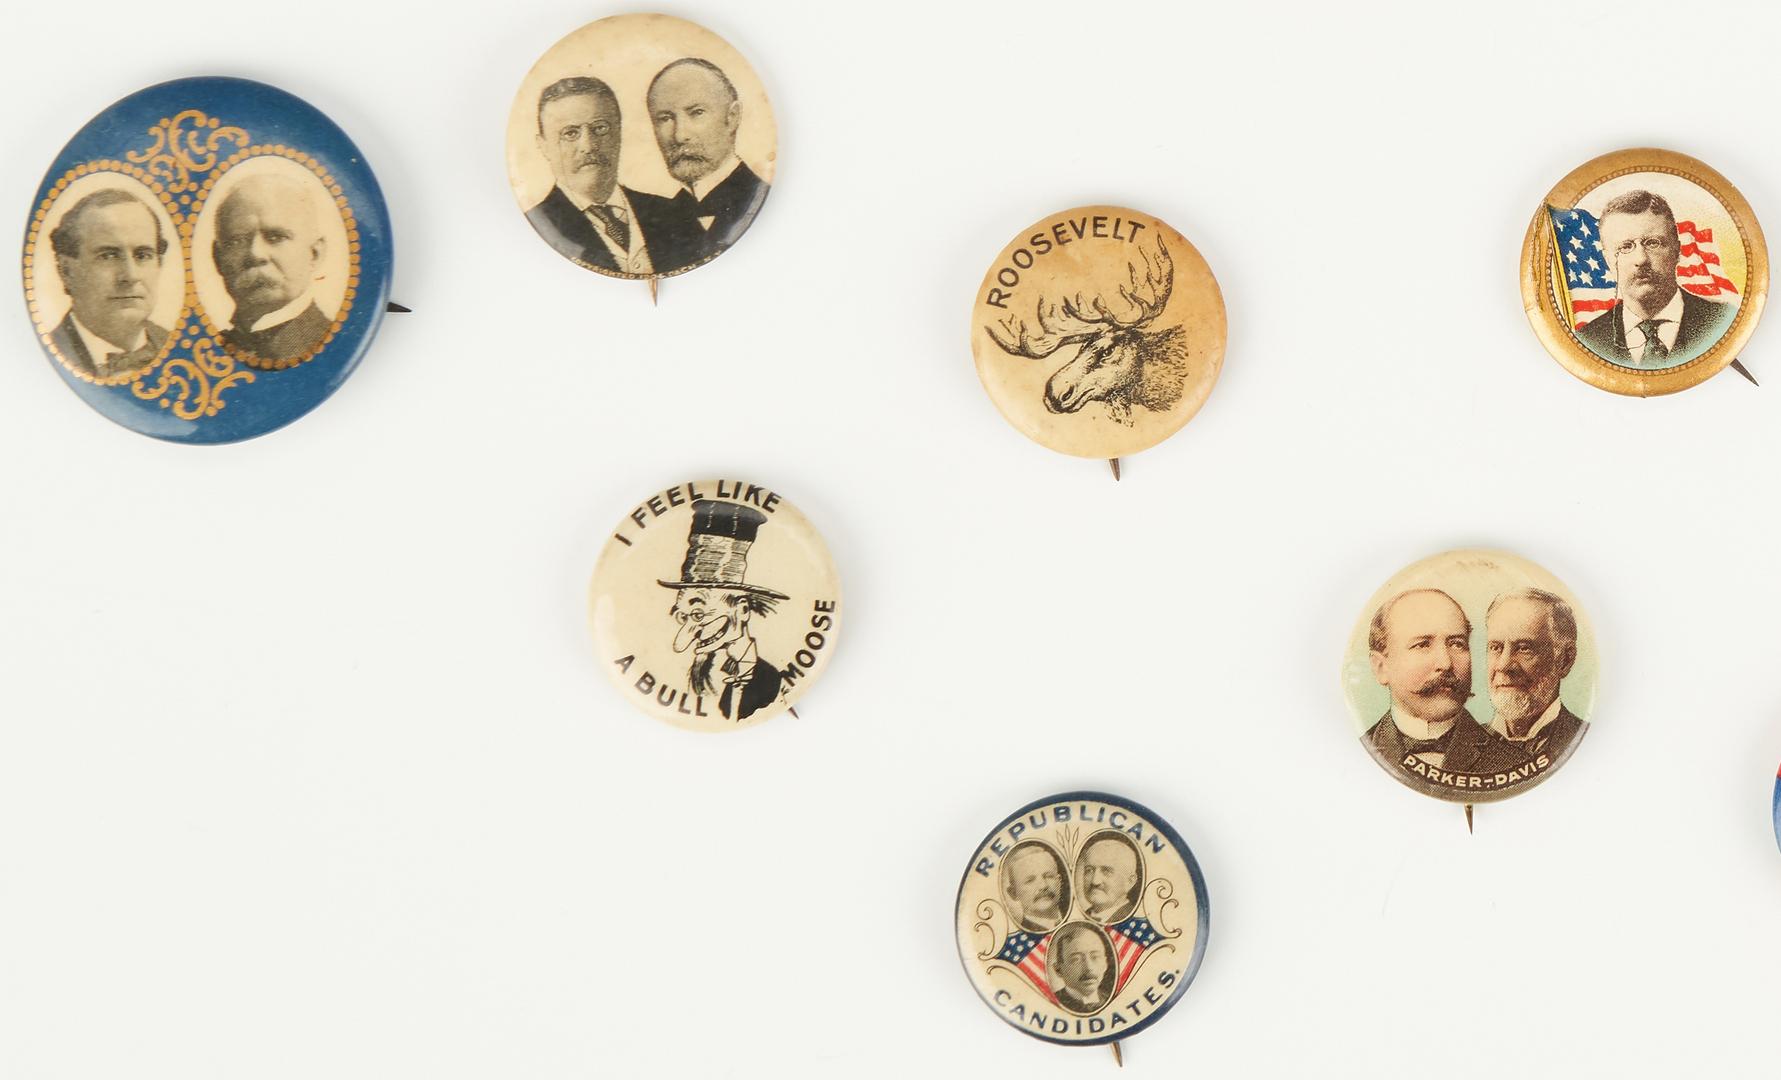 Lot 1009: 28 Political Ephemera Items, incl. McKinley, Roosevelt, Taft